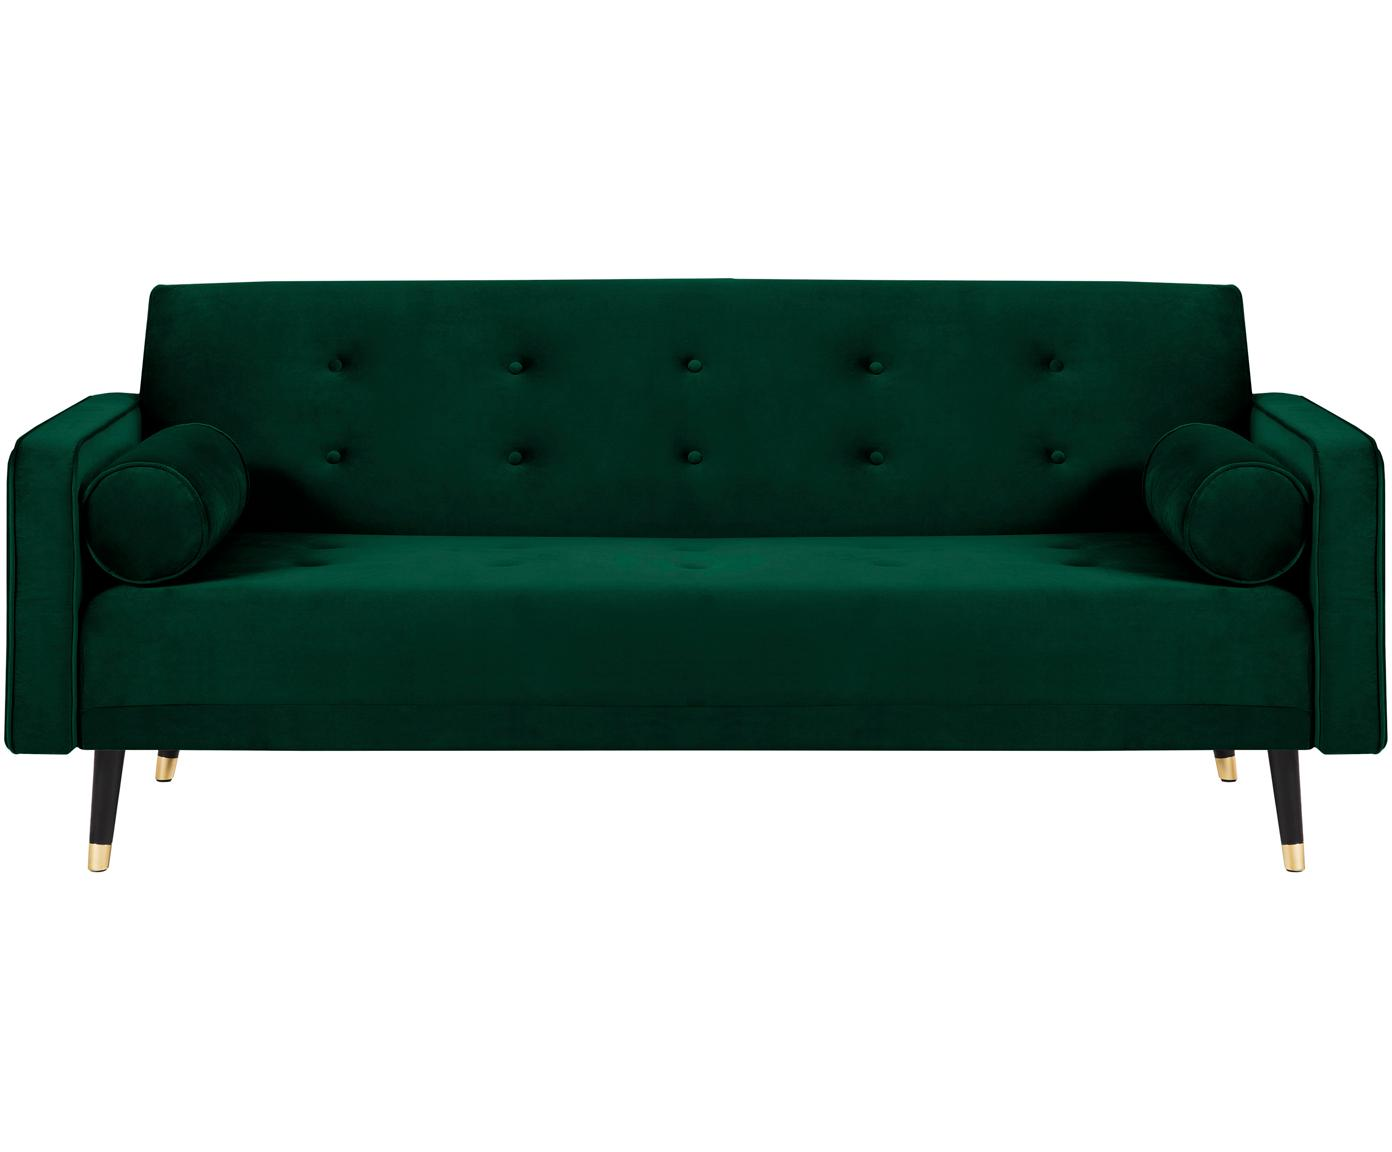 Samt-Schlafsofa Gia (3-Sitzer), Bezug: Polyestersamt, Rahmen: Massives Kiefernholz, Samt Dunkelgrün, B 212 x T 93 cm